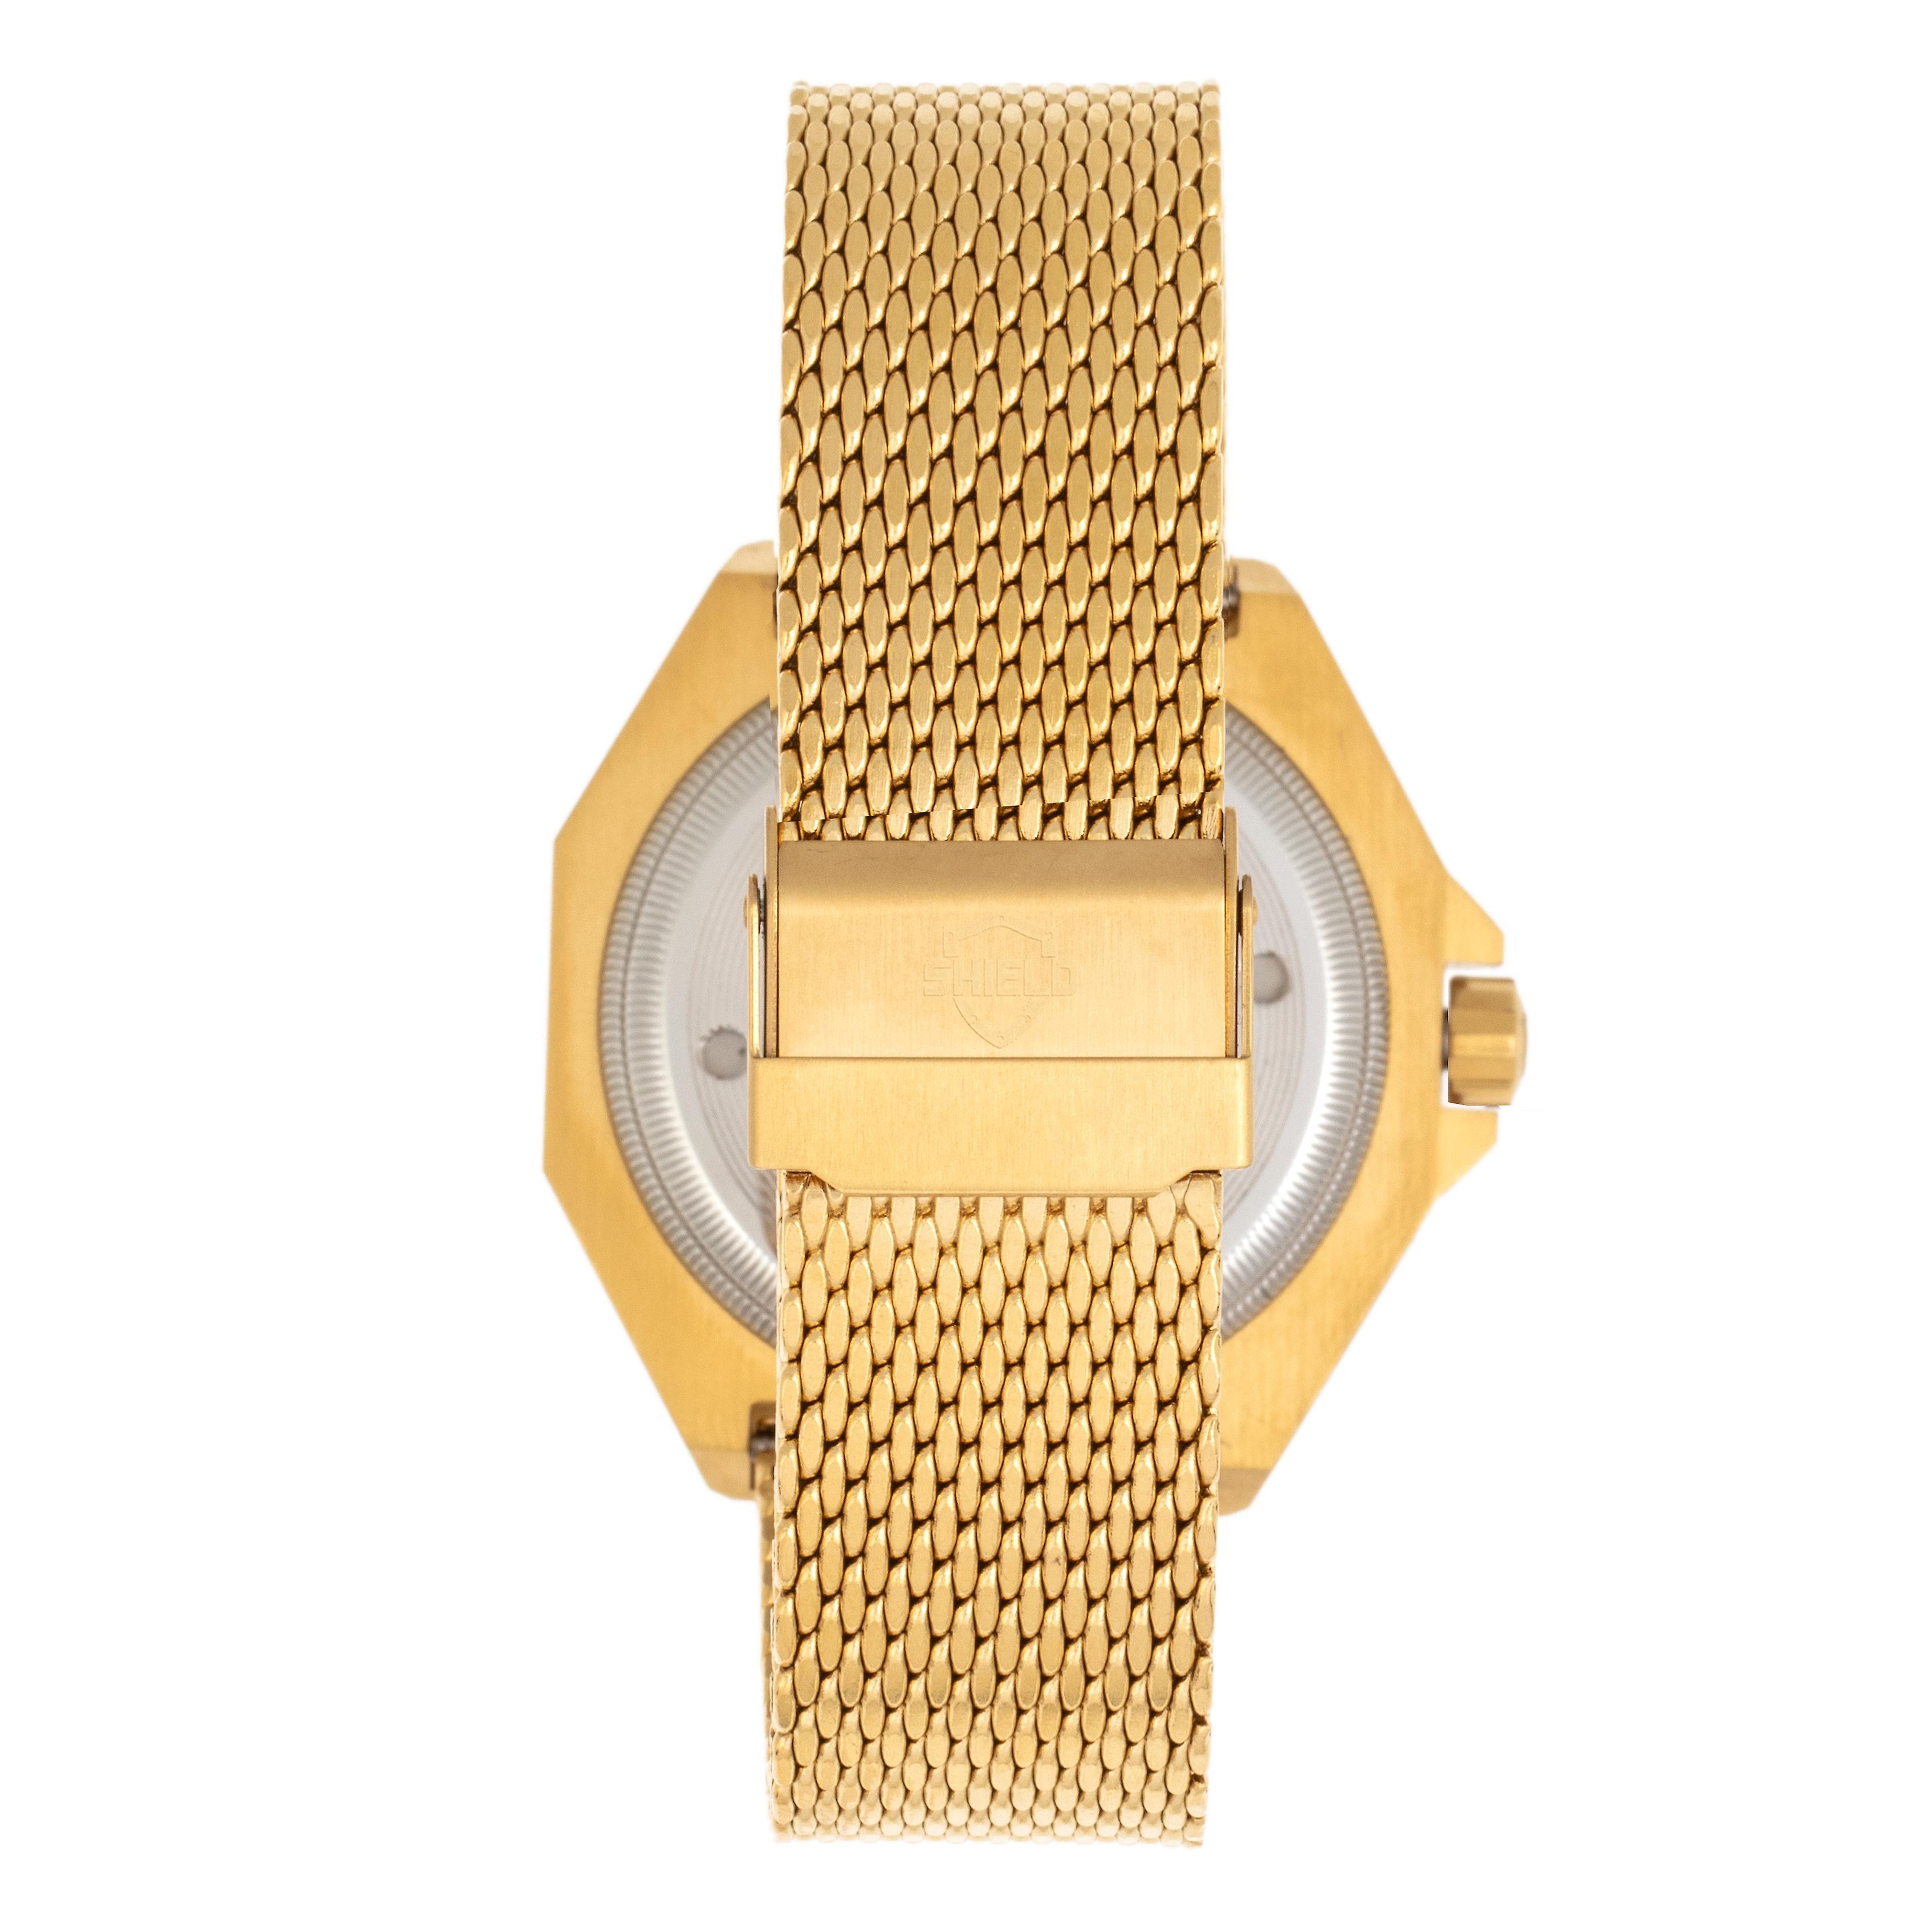 Shield Marius Bracelet Men's Diver Watch w/Date - Gold/Black